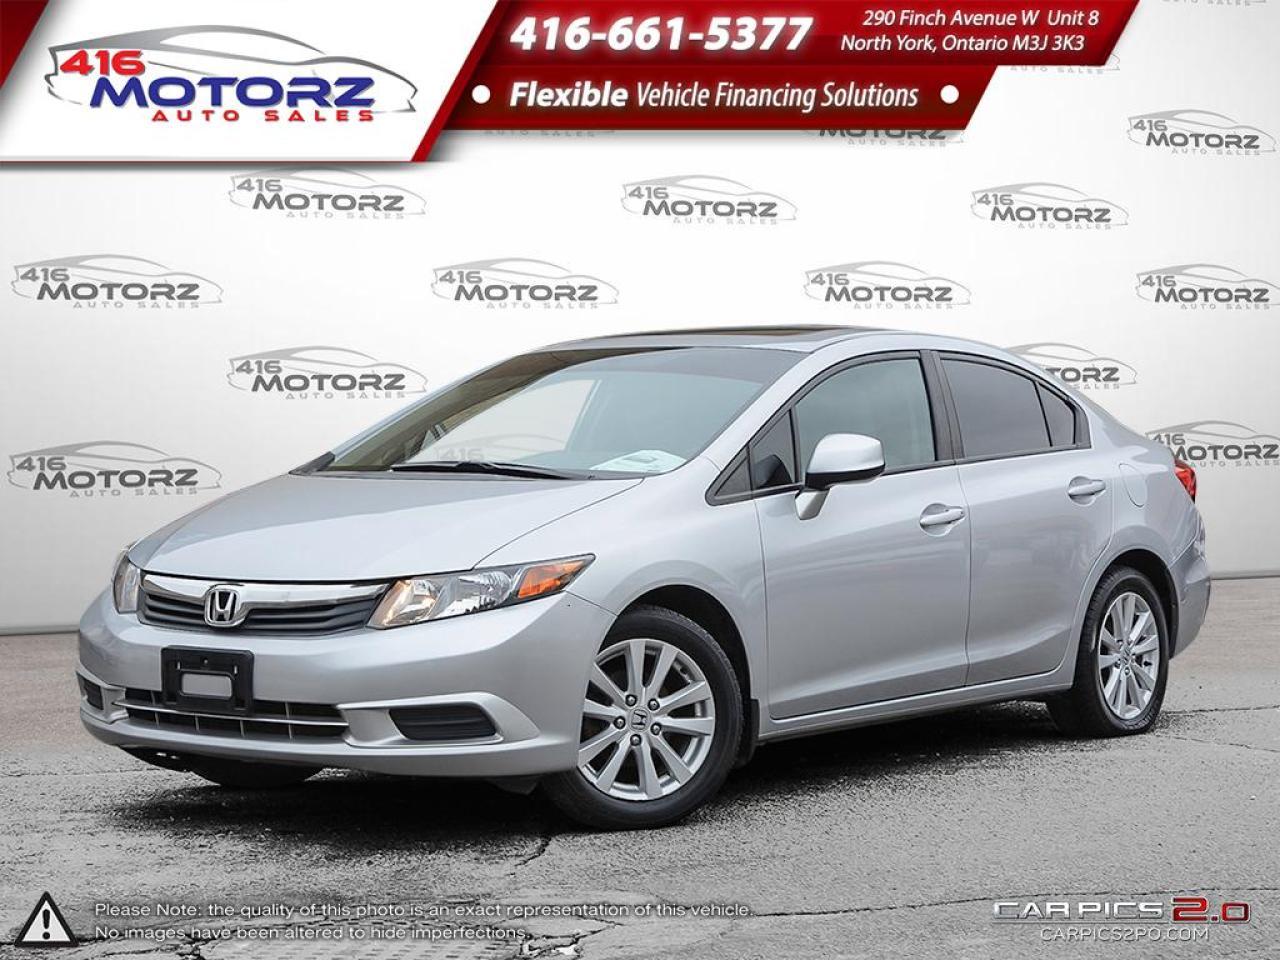 2012 Honda Civic Sedan EX  - Sunroof -  Bluetooth - $62.10 B/W